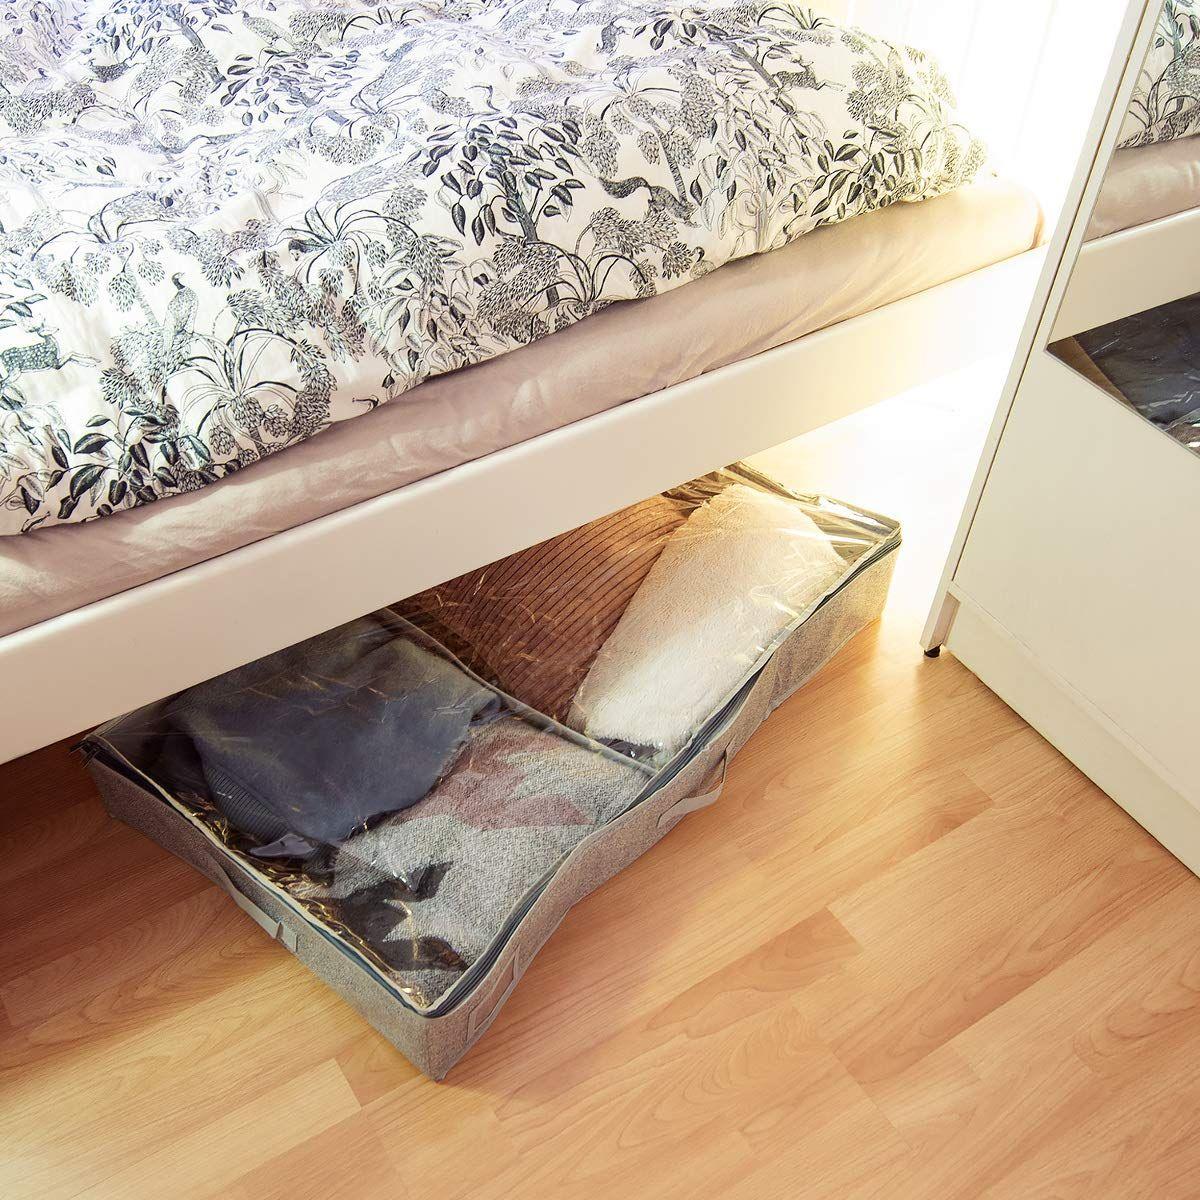 Unterbettkommode Unterbettkommode Kommode Aufbewahrung Flur